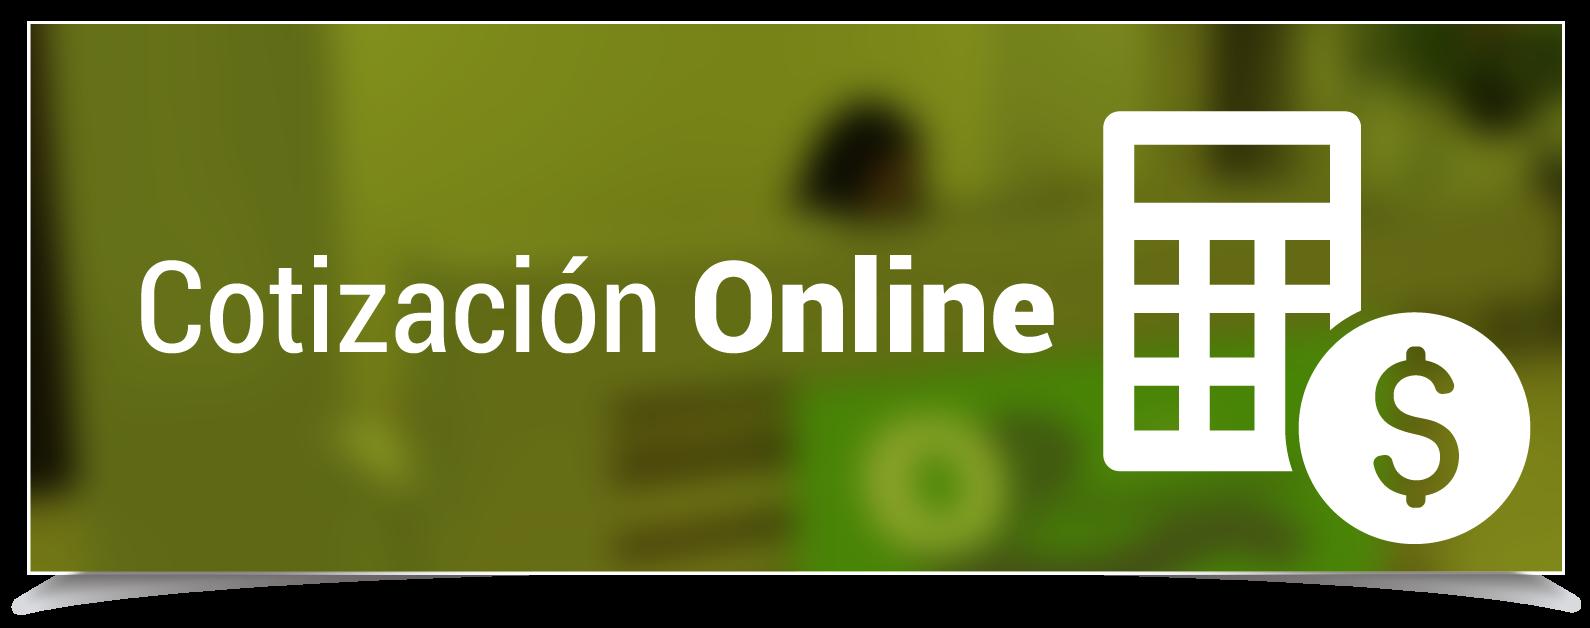 optransportadora_cotizacion_online